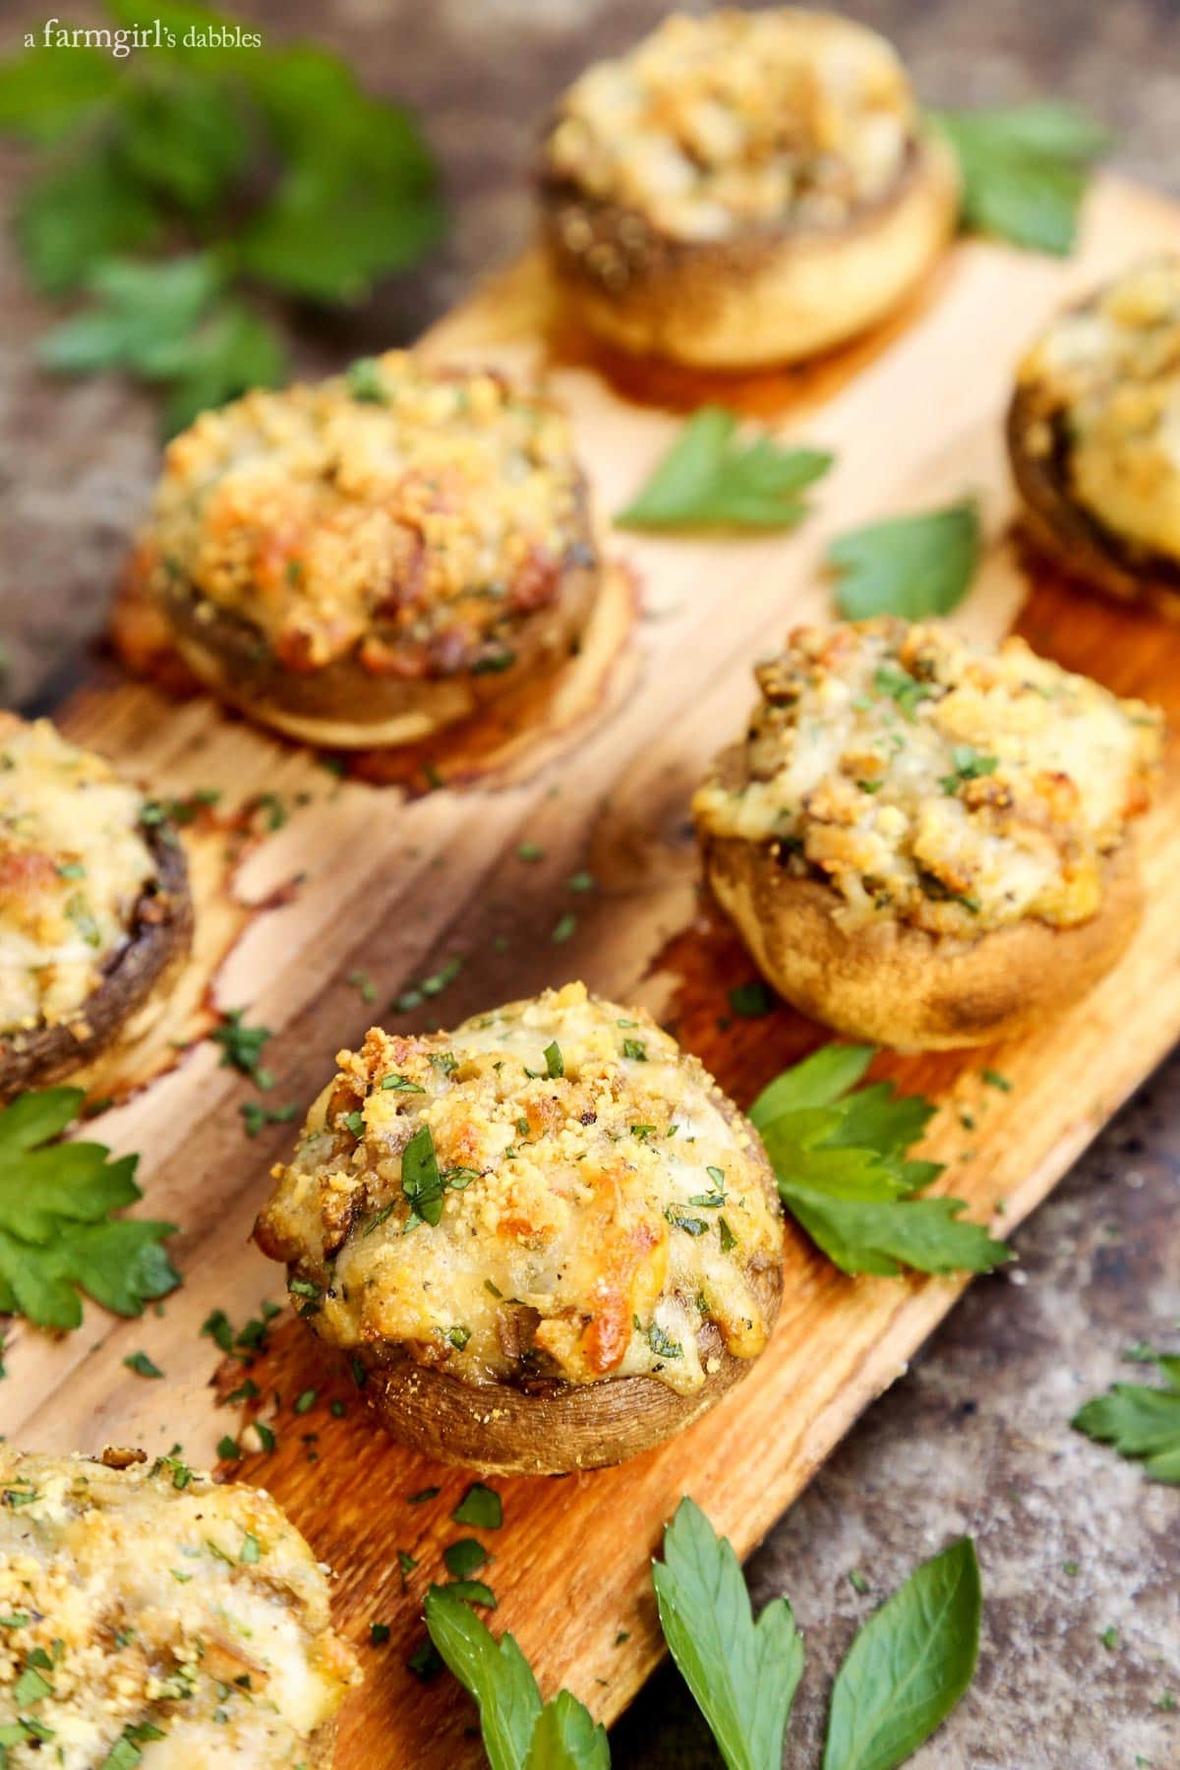 Cheesy-Stuffed-Mushrooms-Grilled-on-a-Cedar-Plank AFarmgirlsDabbles AFD-7